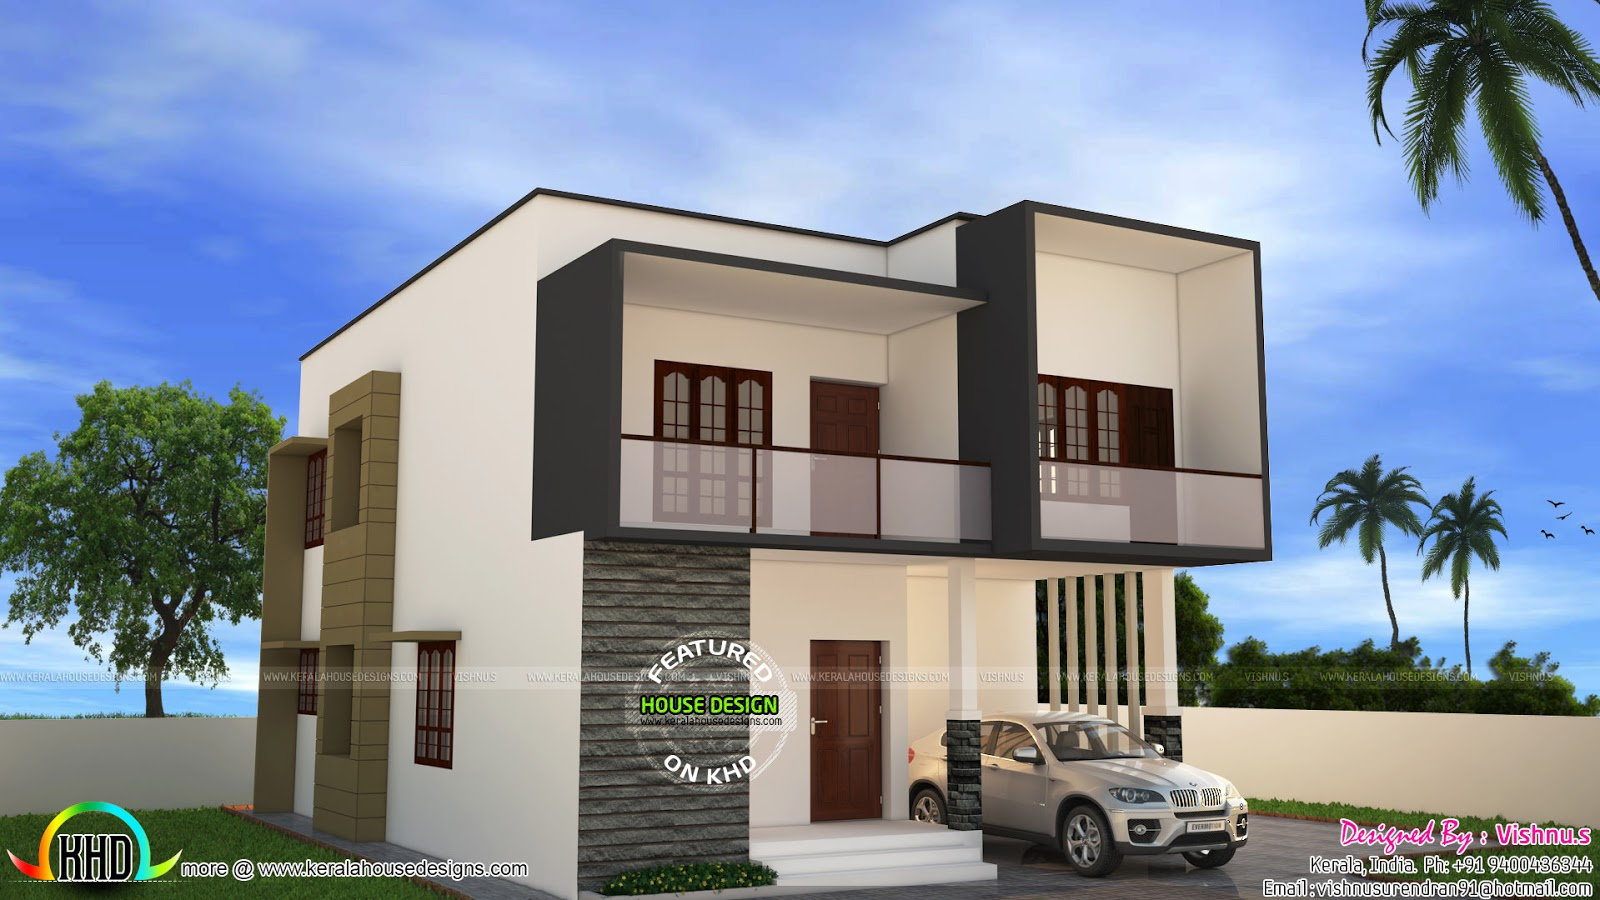 Simple modern house by Vishnu S - Kerala home design and ...